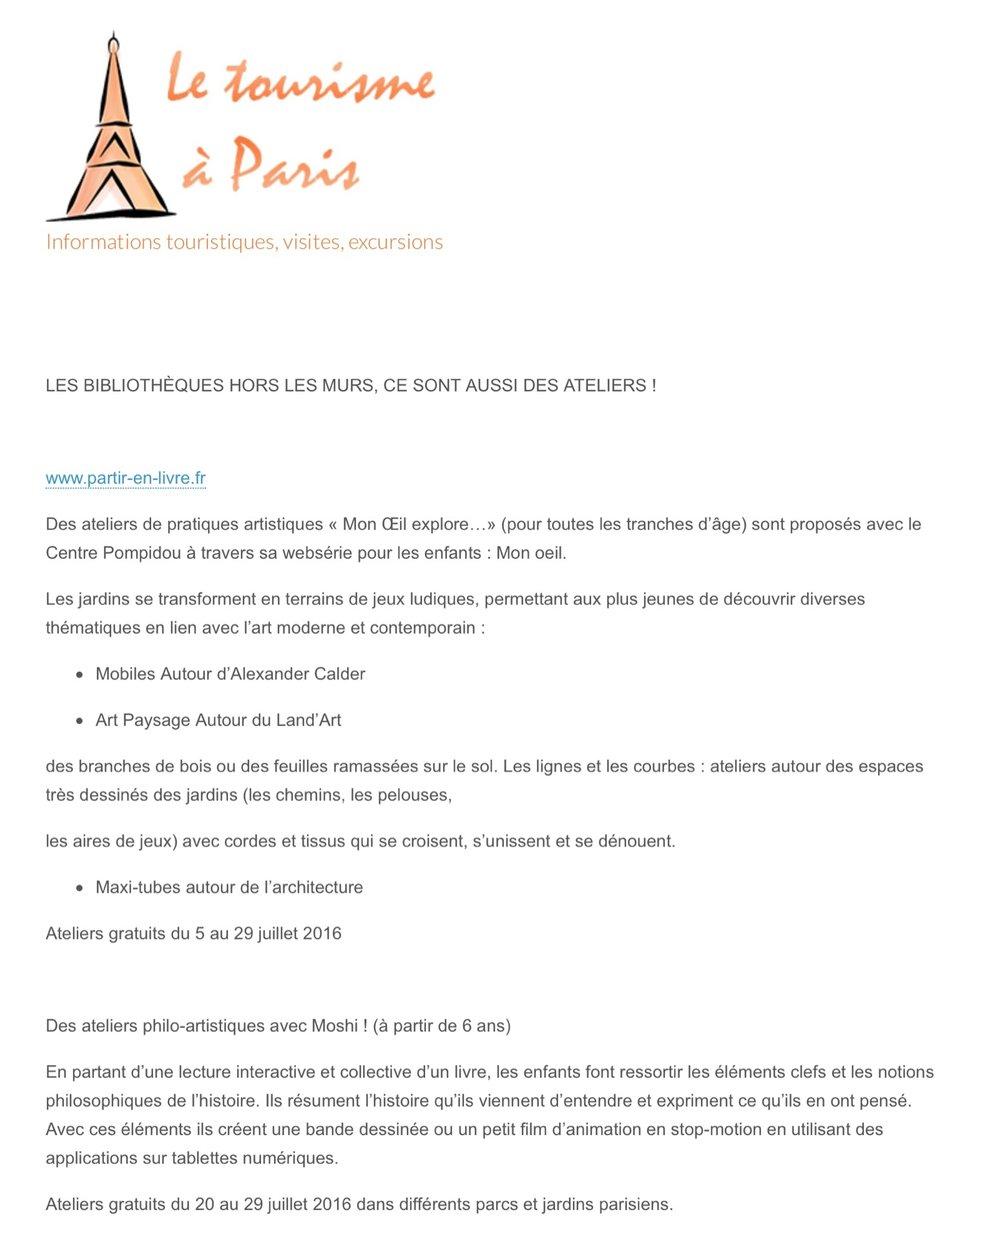 tourisme à paris.JPG